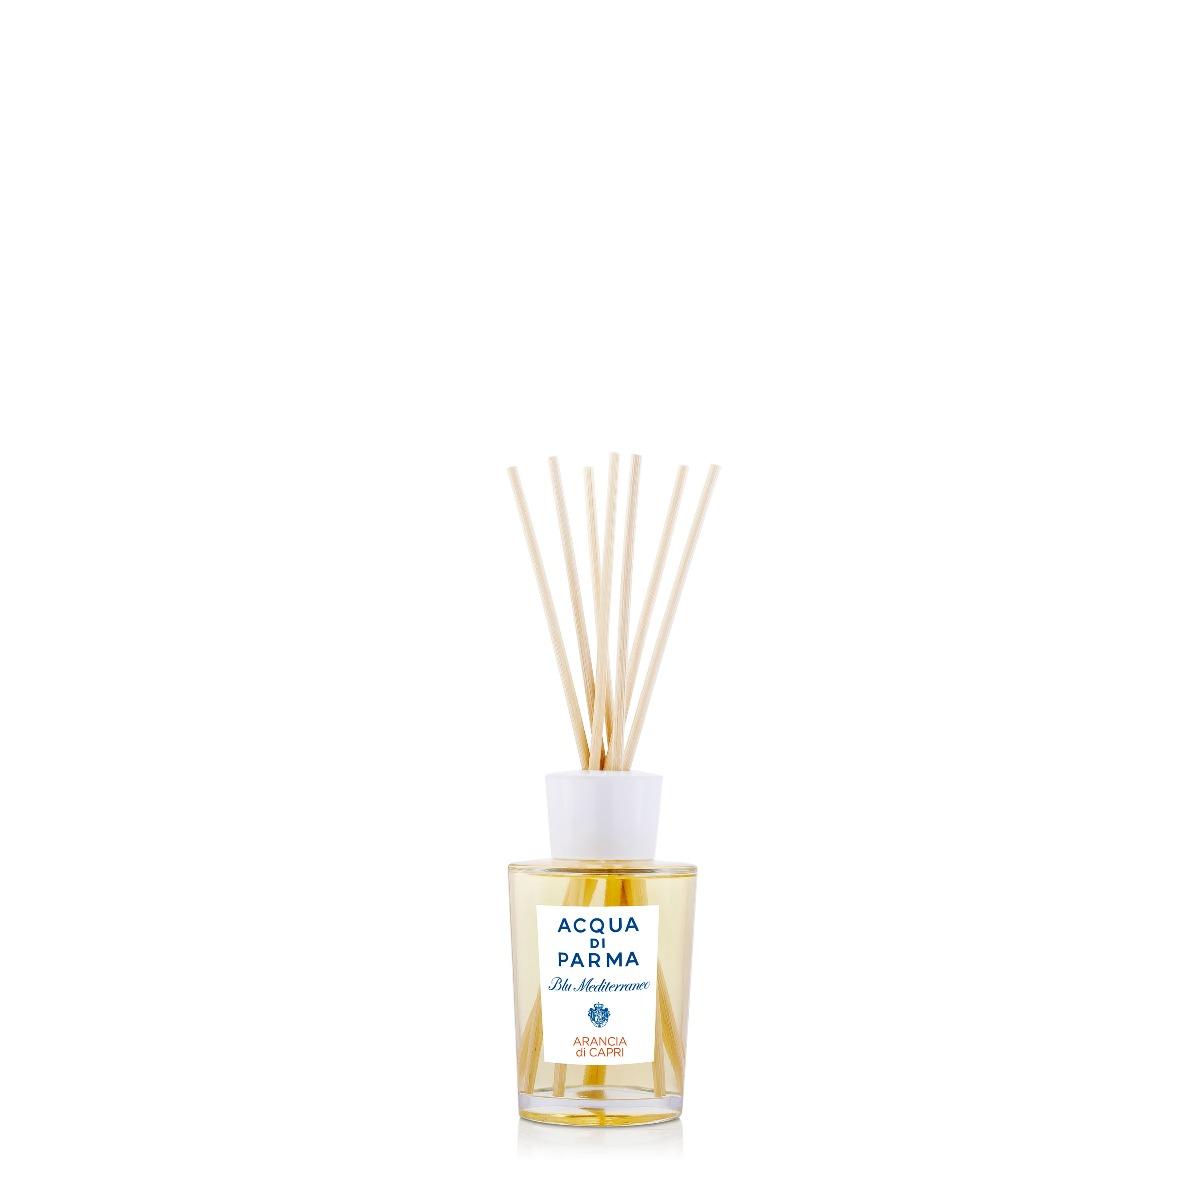 Dyfuzor zapachowy BM Arancia di capri 180ml Miloo Home 62205